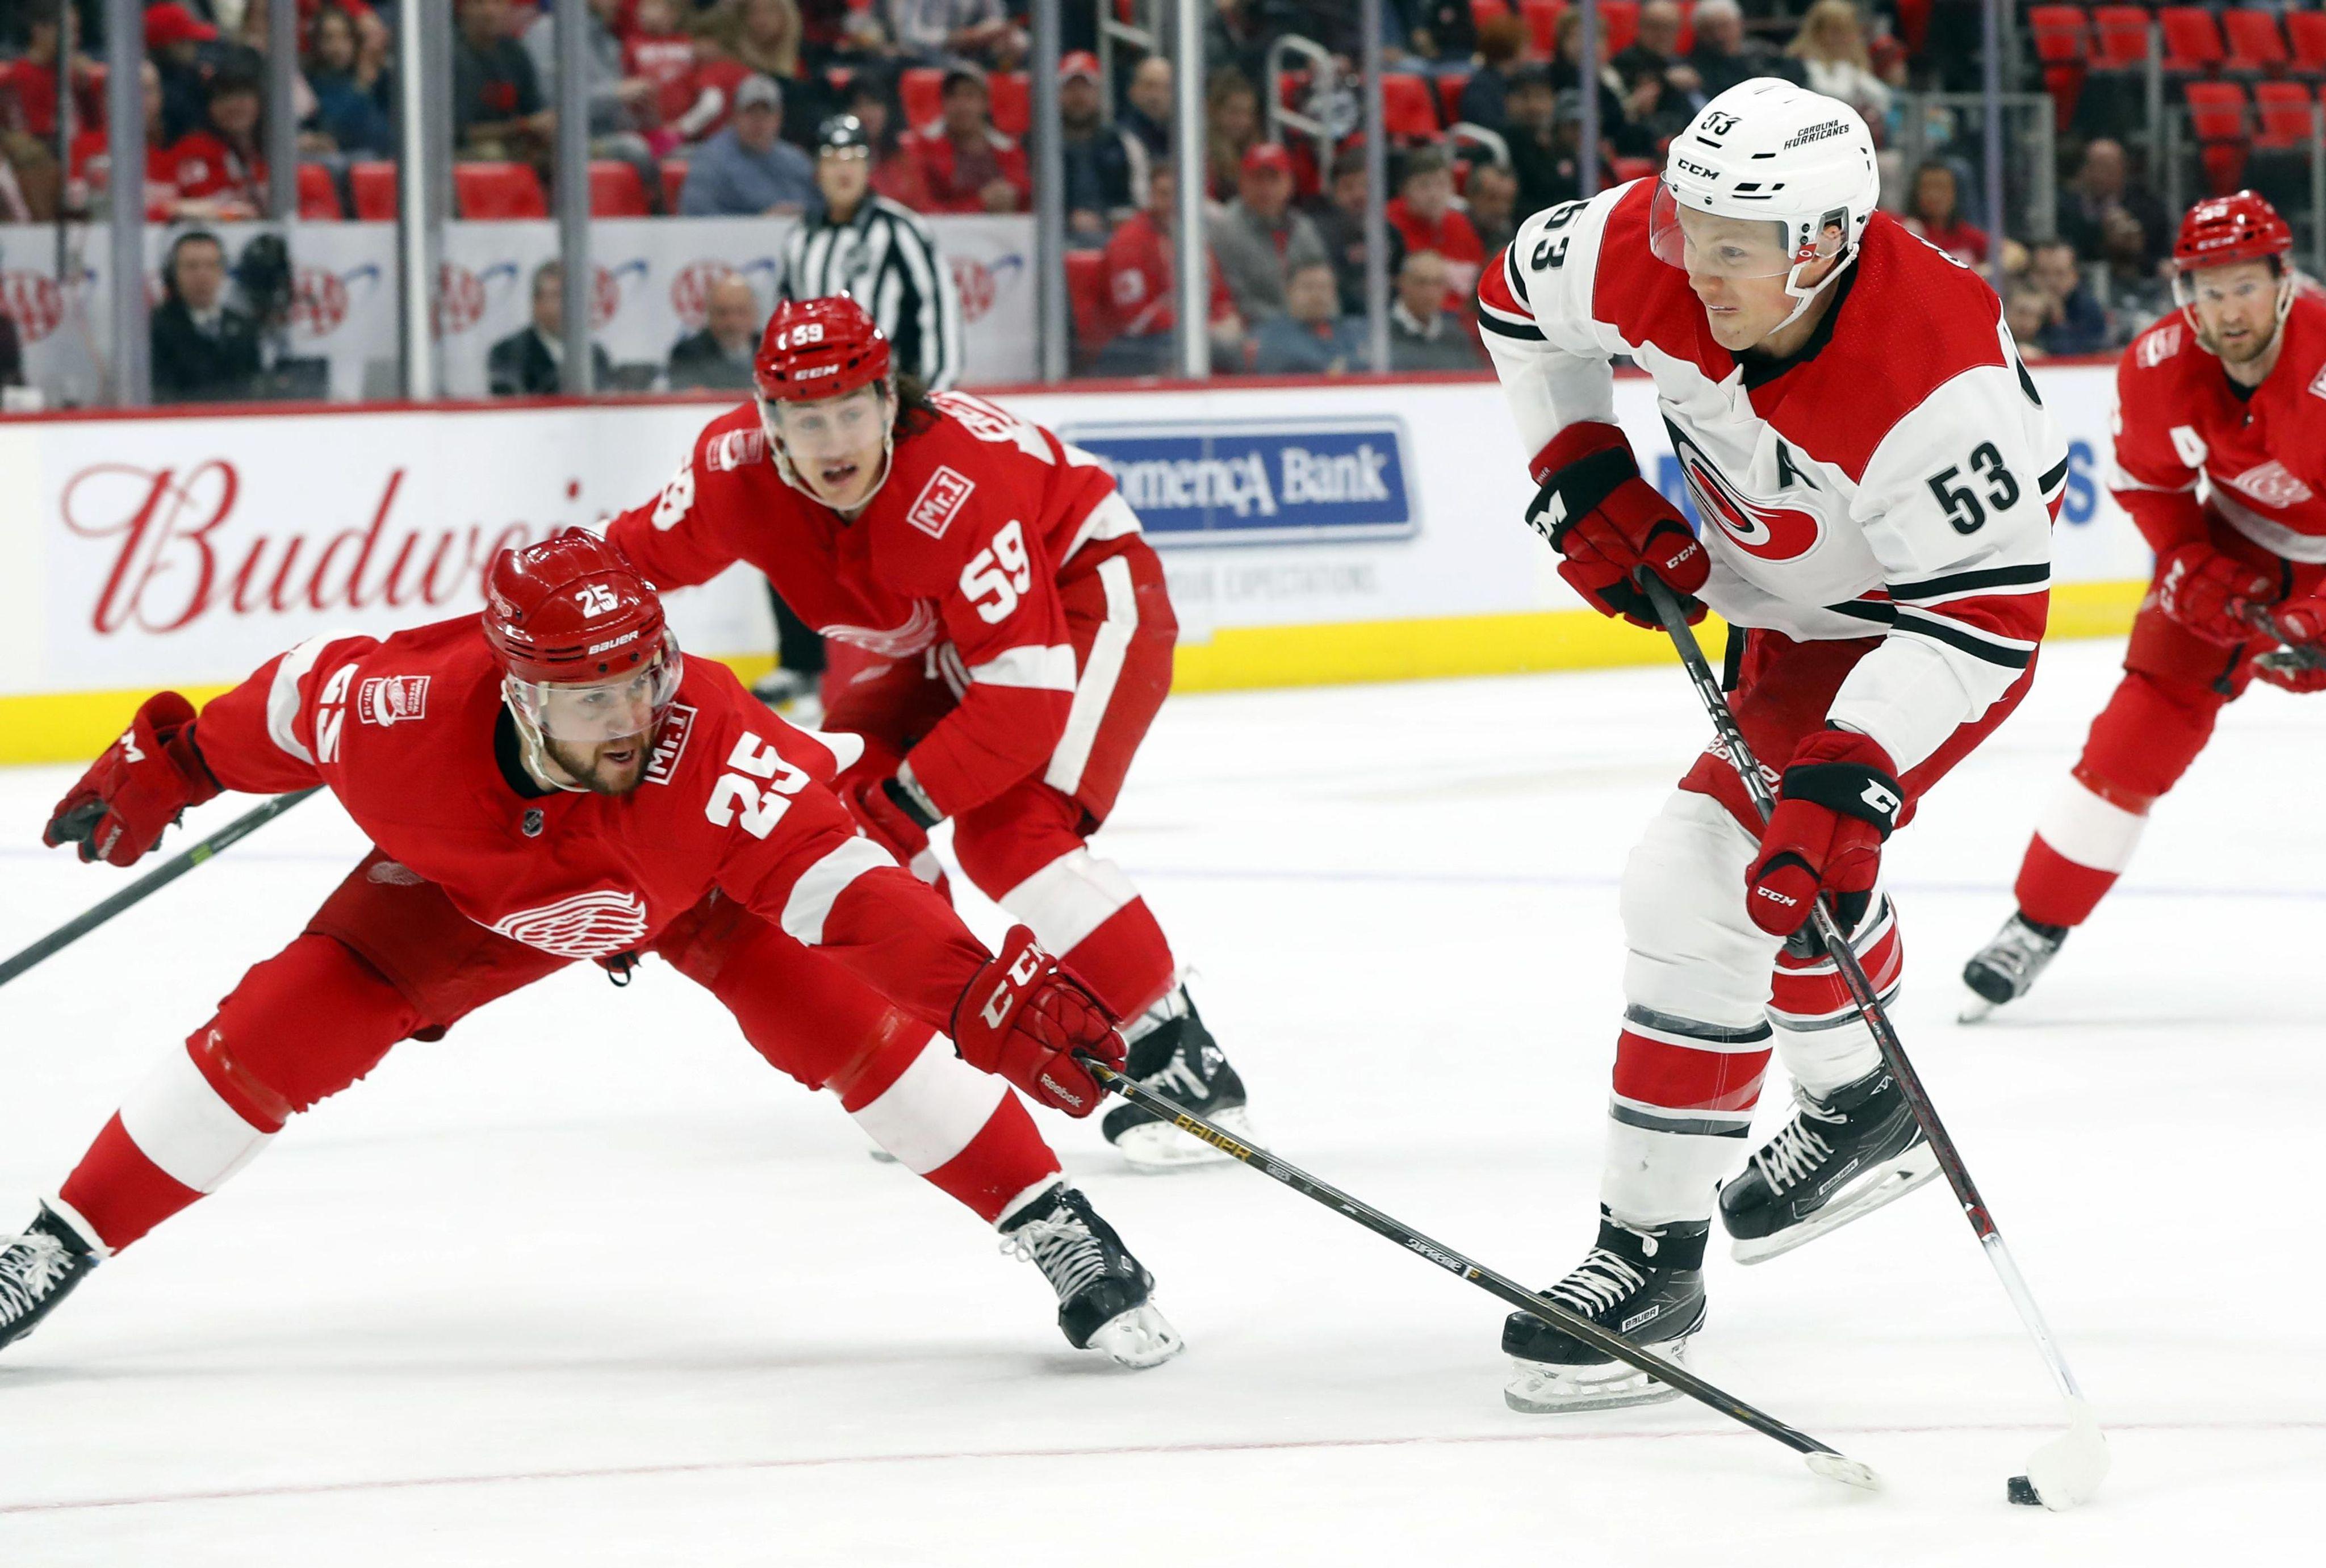 Hurricanes_red_wings_hockey_99447_s4096x2761